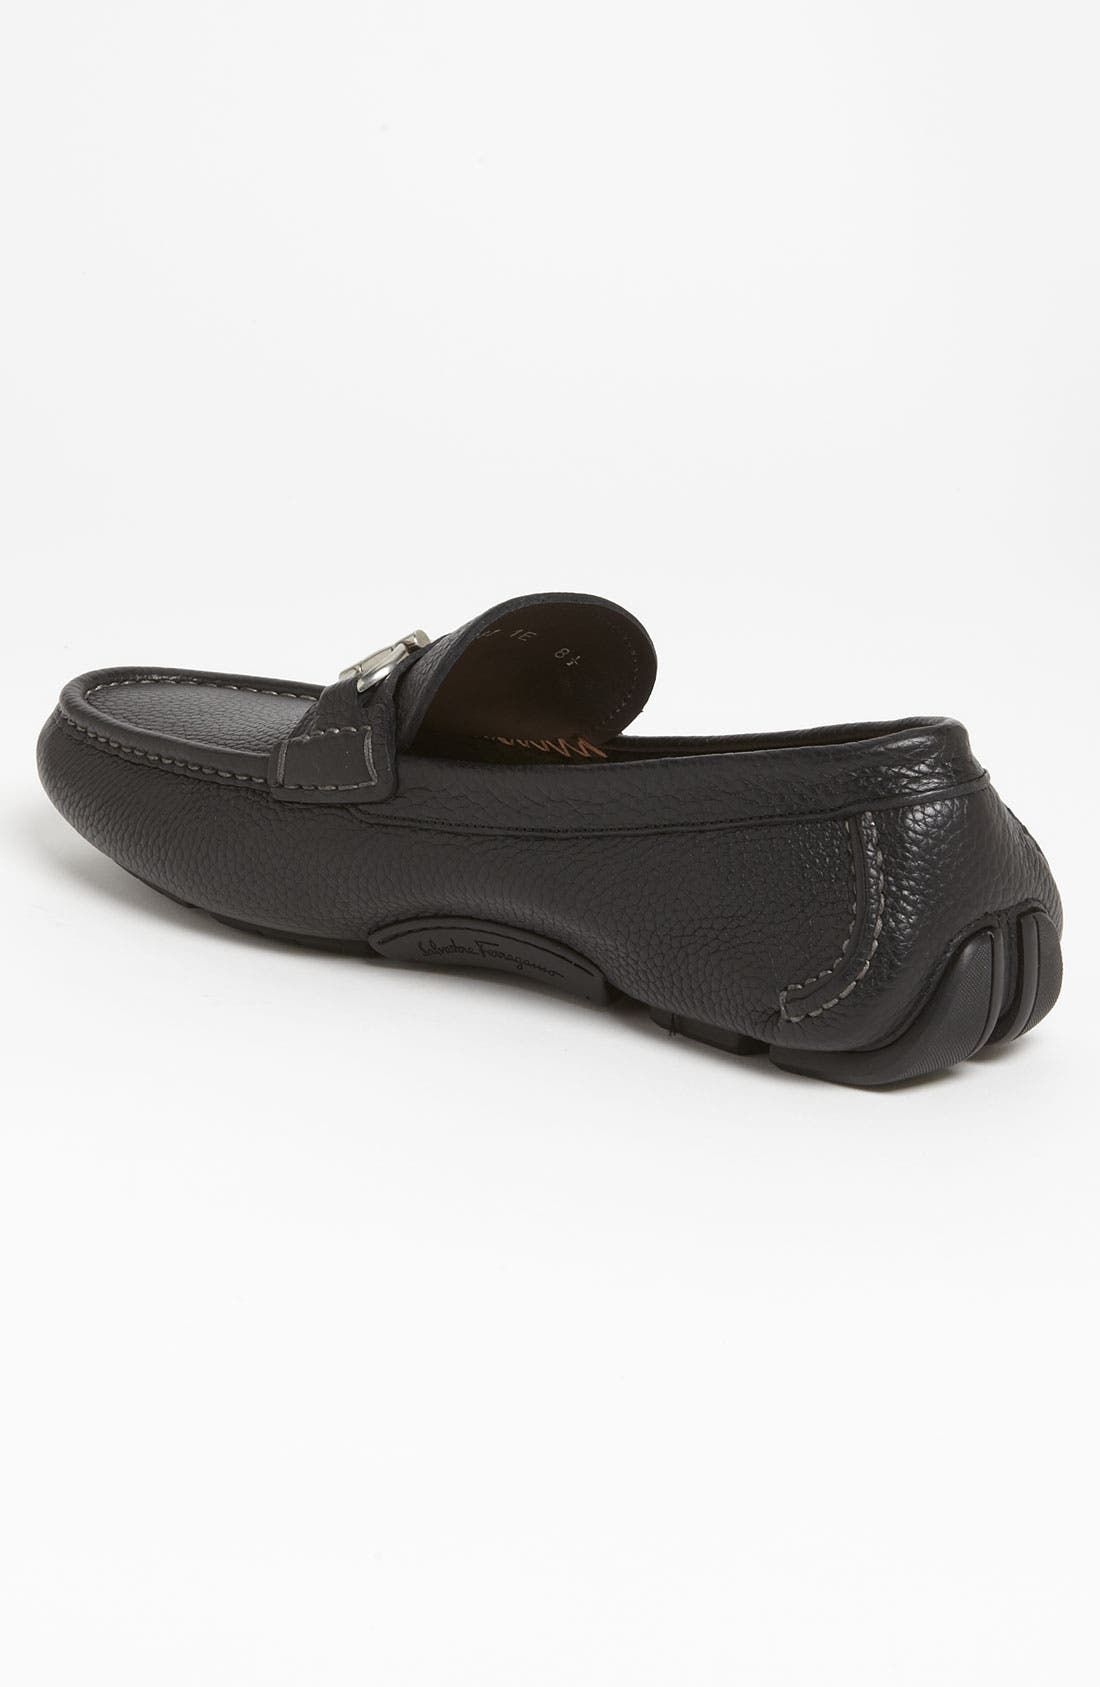 Alternate Image 2  - Salvatore Ferragamo 'Daverio' Driving Shoe (Men)